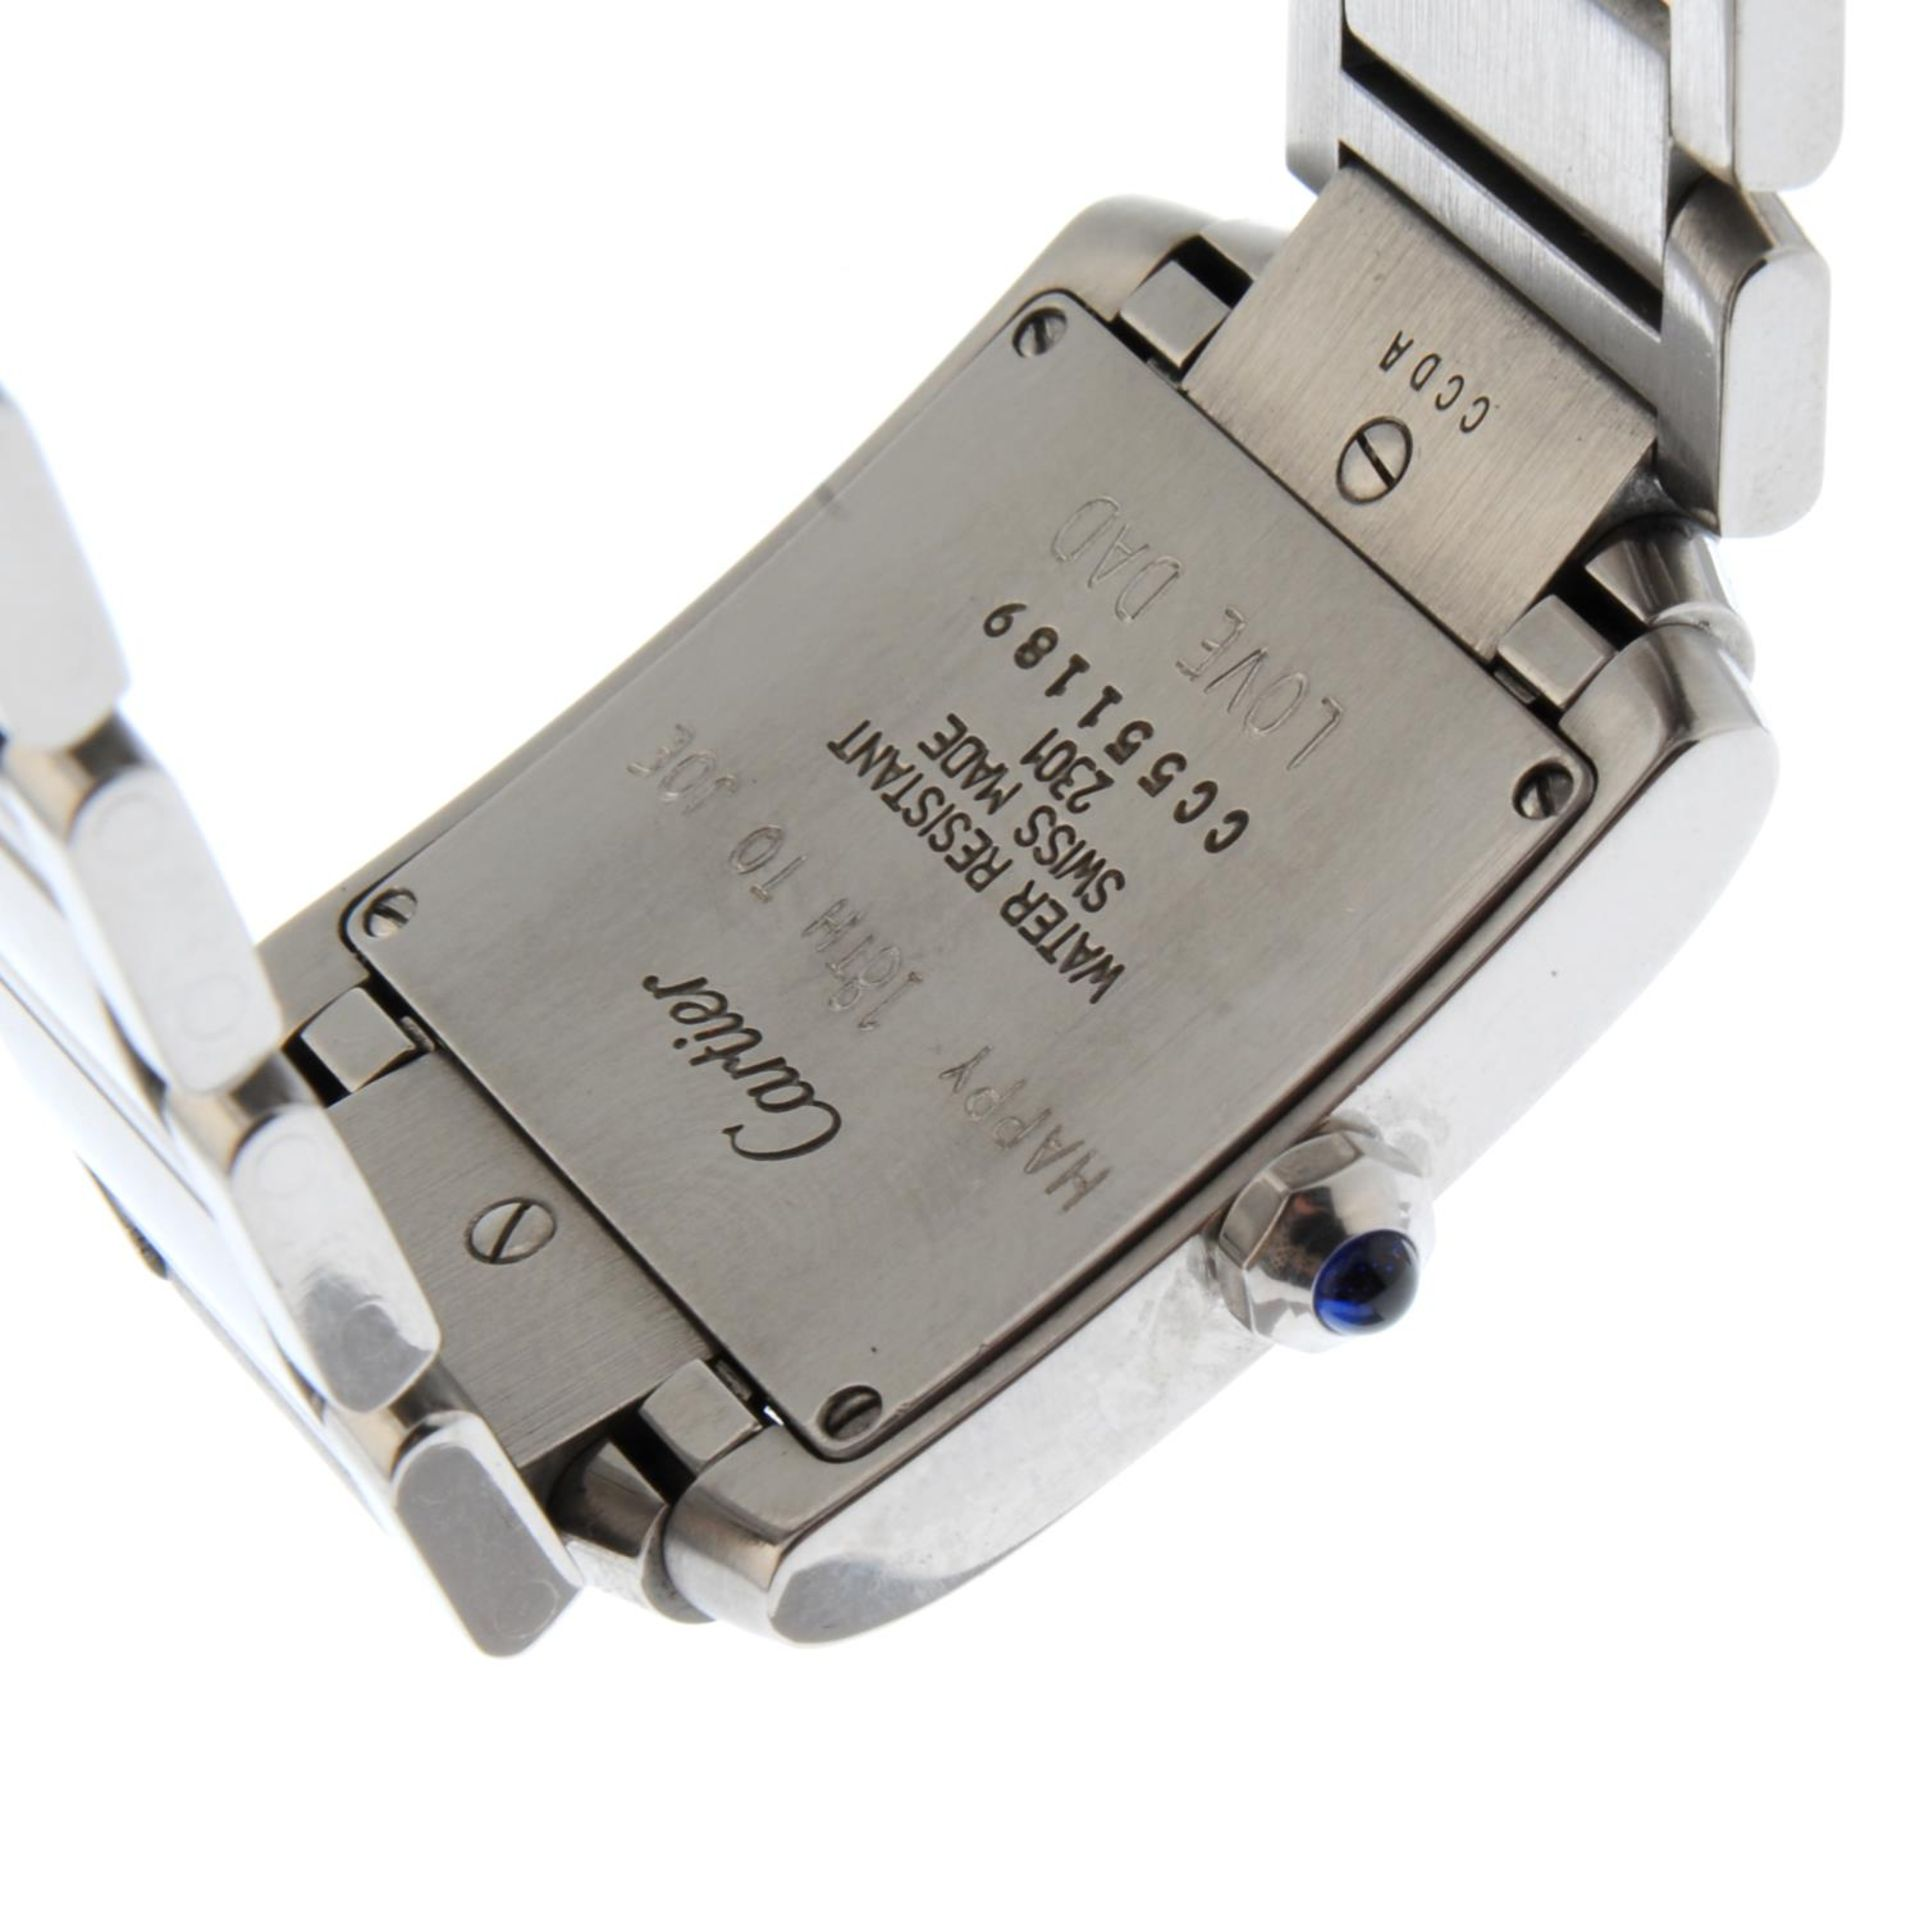 CARTIER - a Tank Francaise bracelet watch. - Bild 2 aus 5